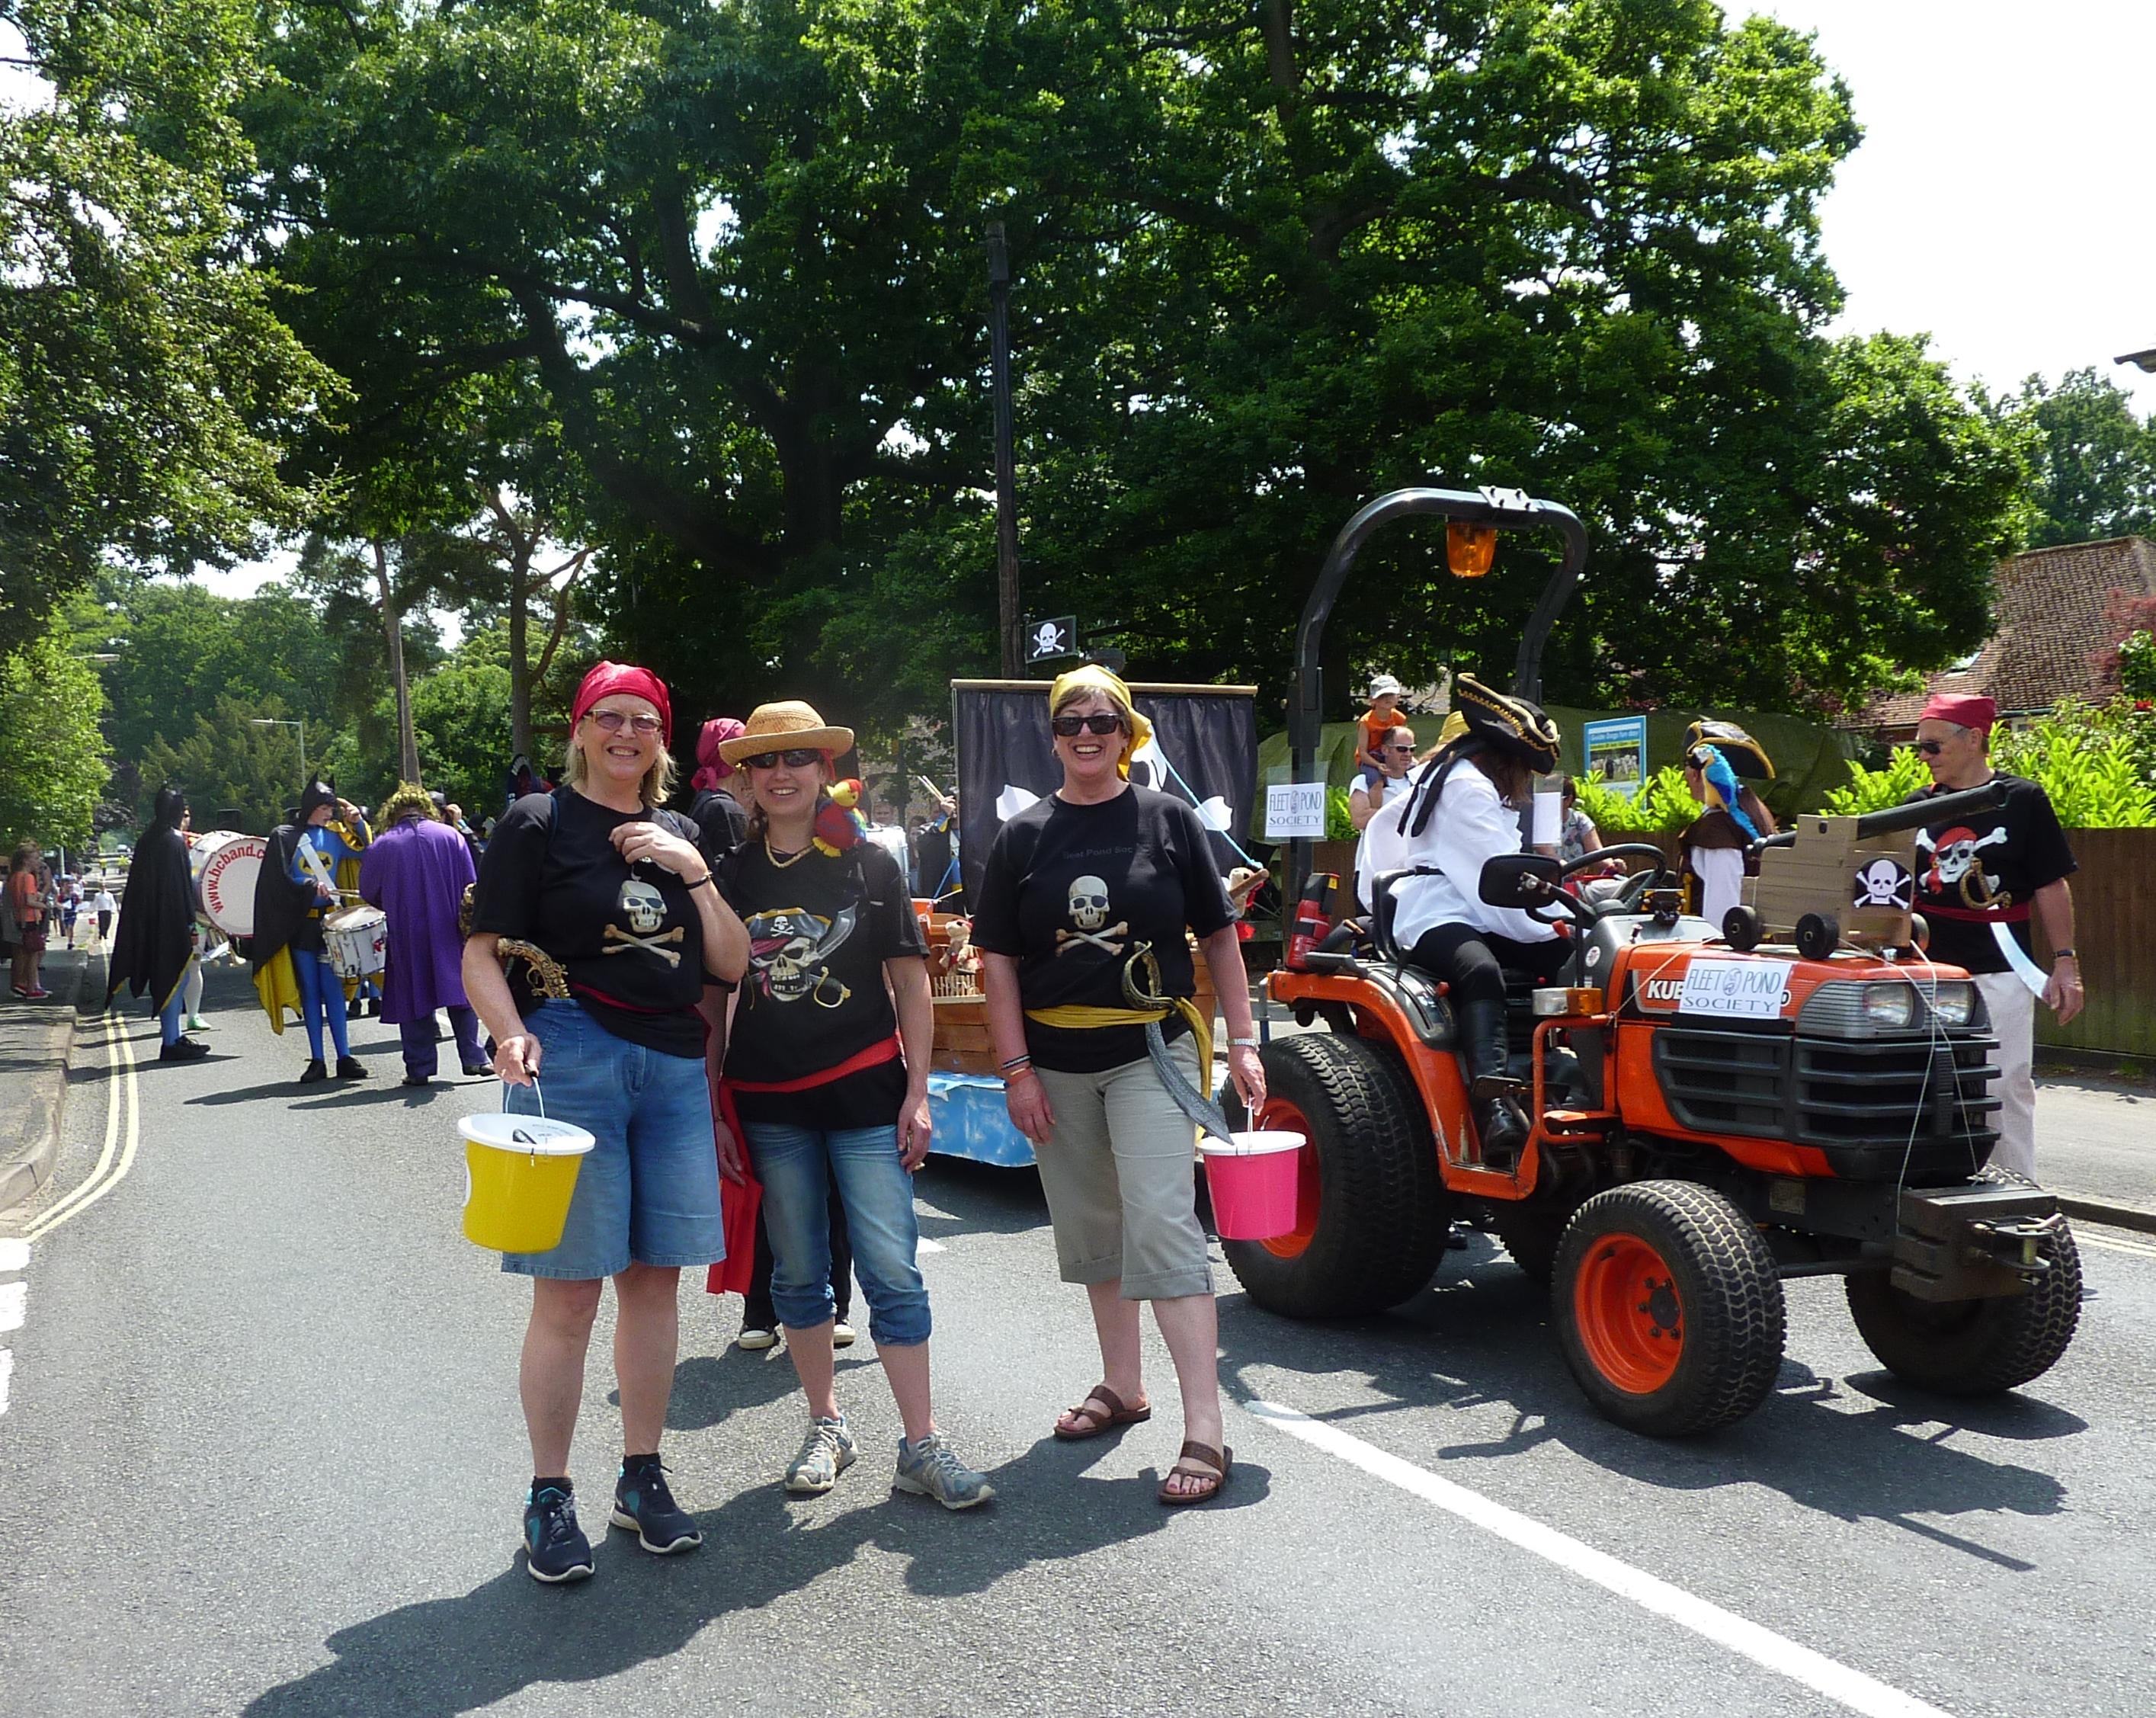 Carnival 2013 - Halt on Connaught Road